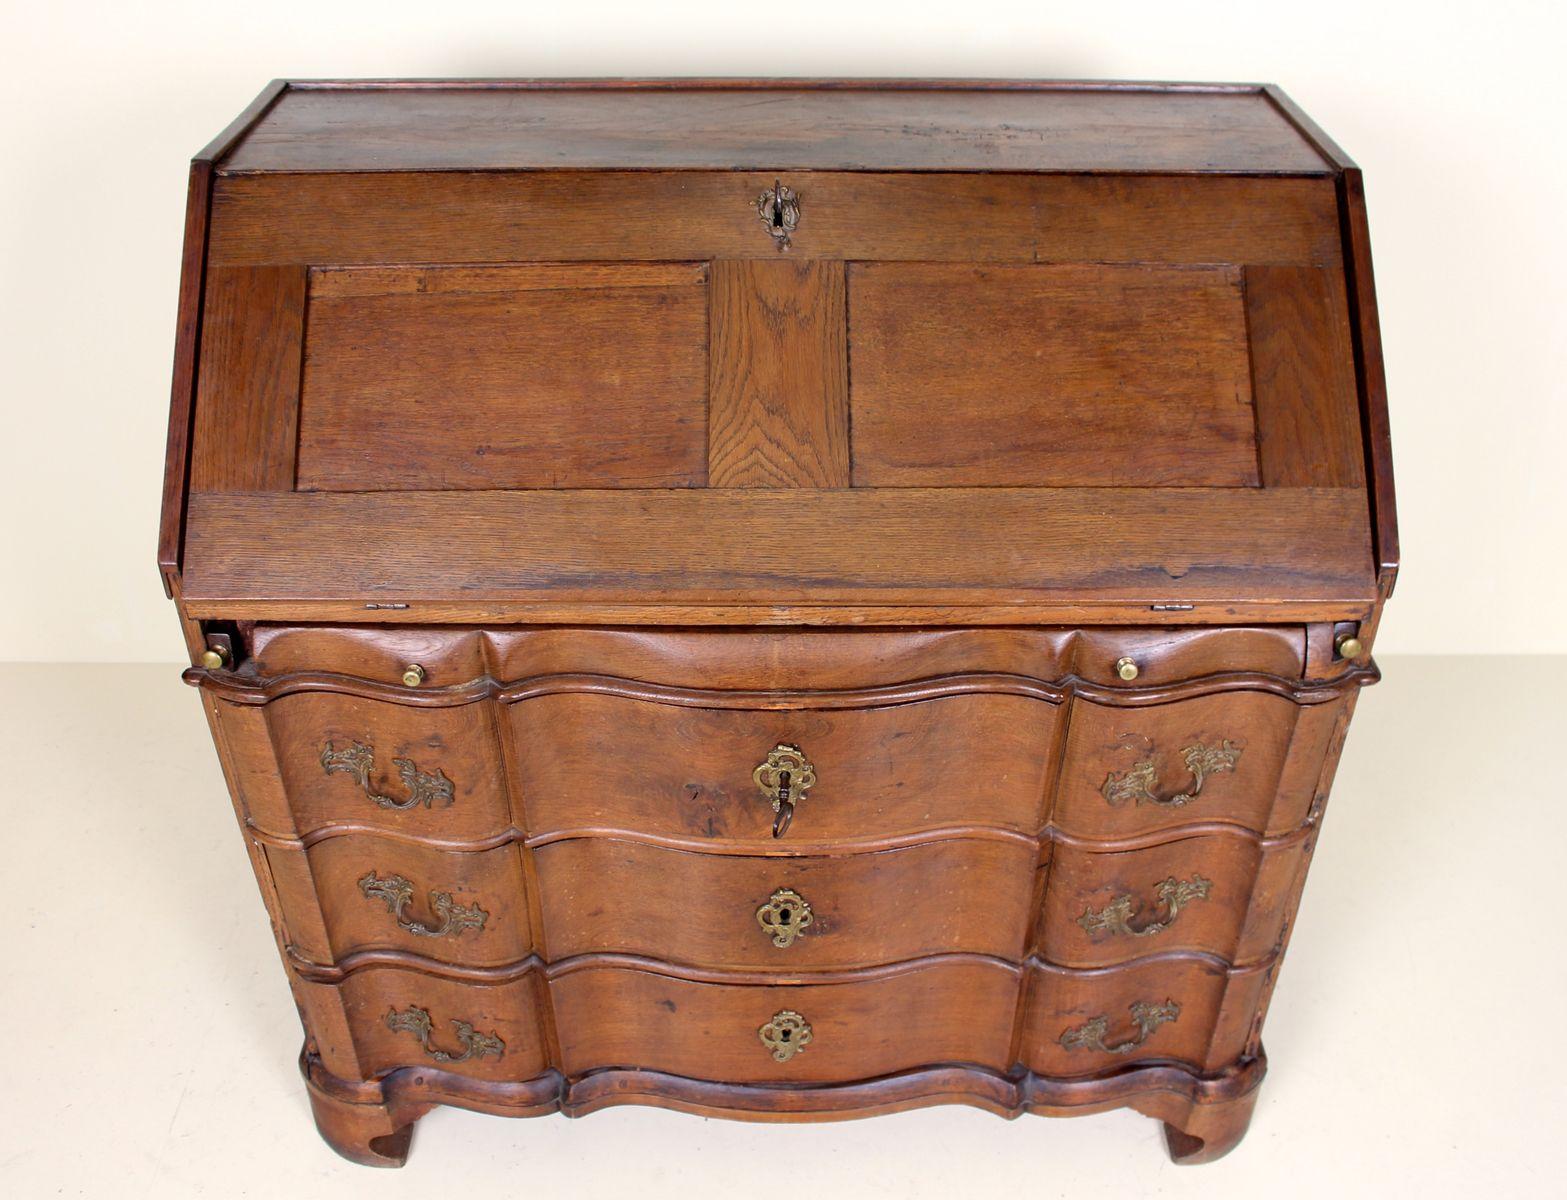 Antique Swedish Nautical Desk - Antique Swedish Nautical Desk For Sale At Pamono